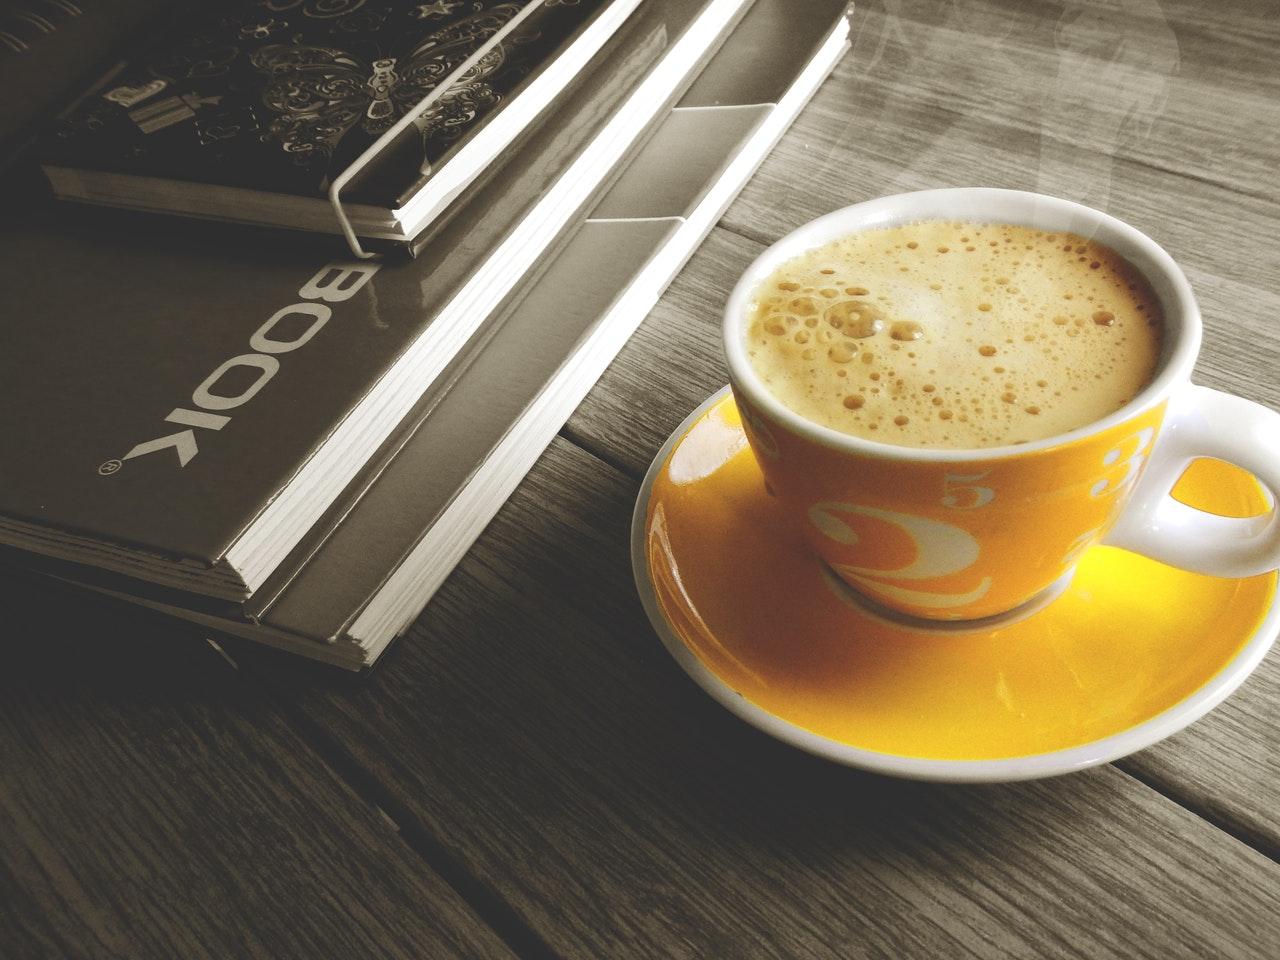 Cangkir kopi dan majalah